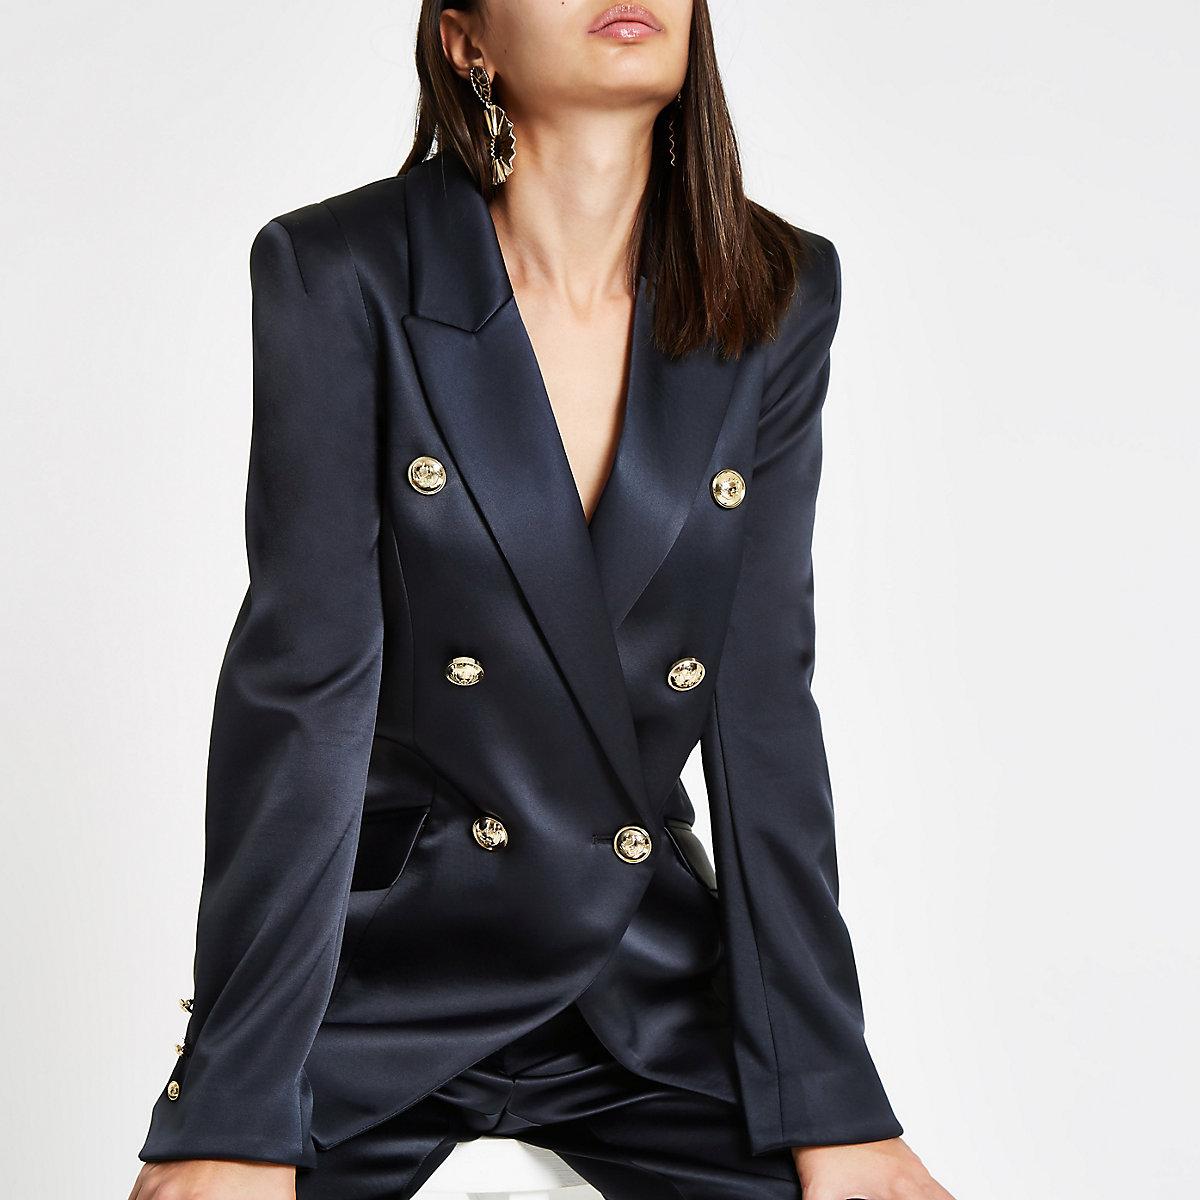 Navy satin double breasted tux jacket